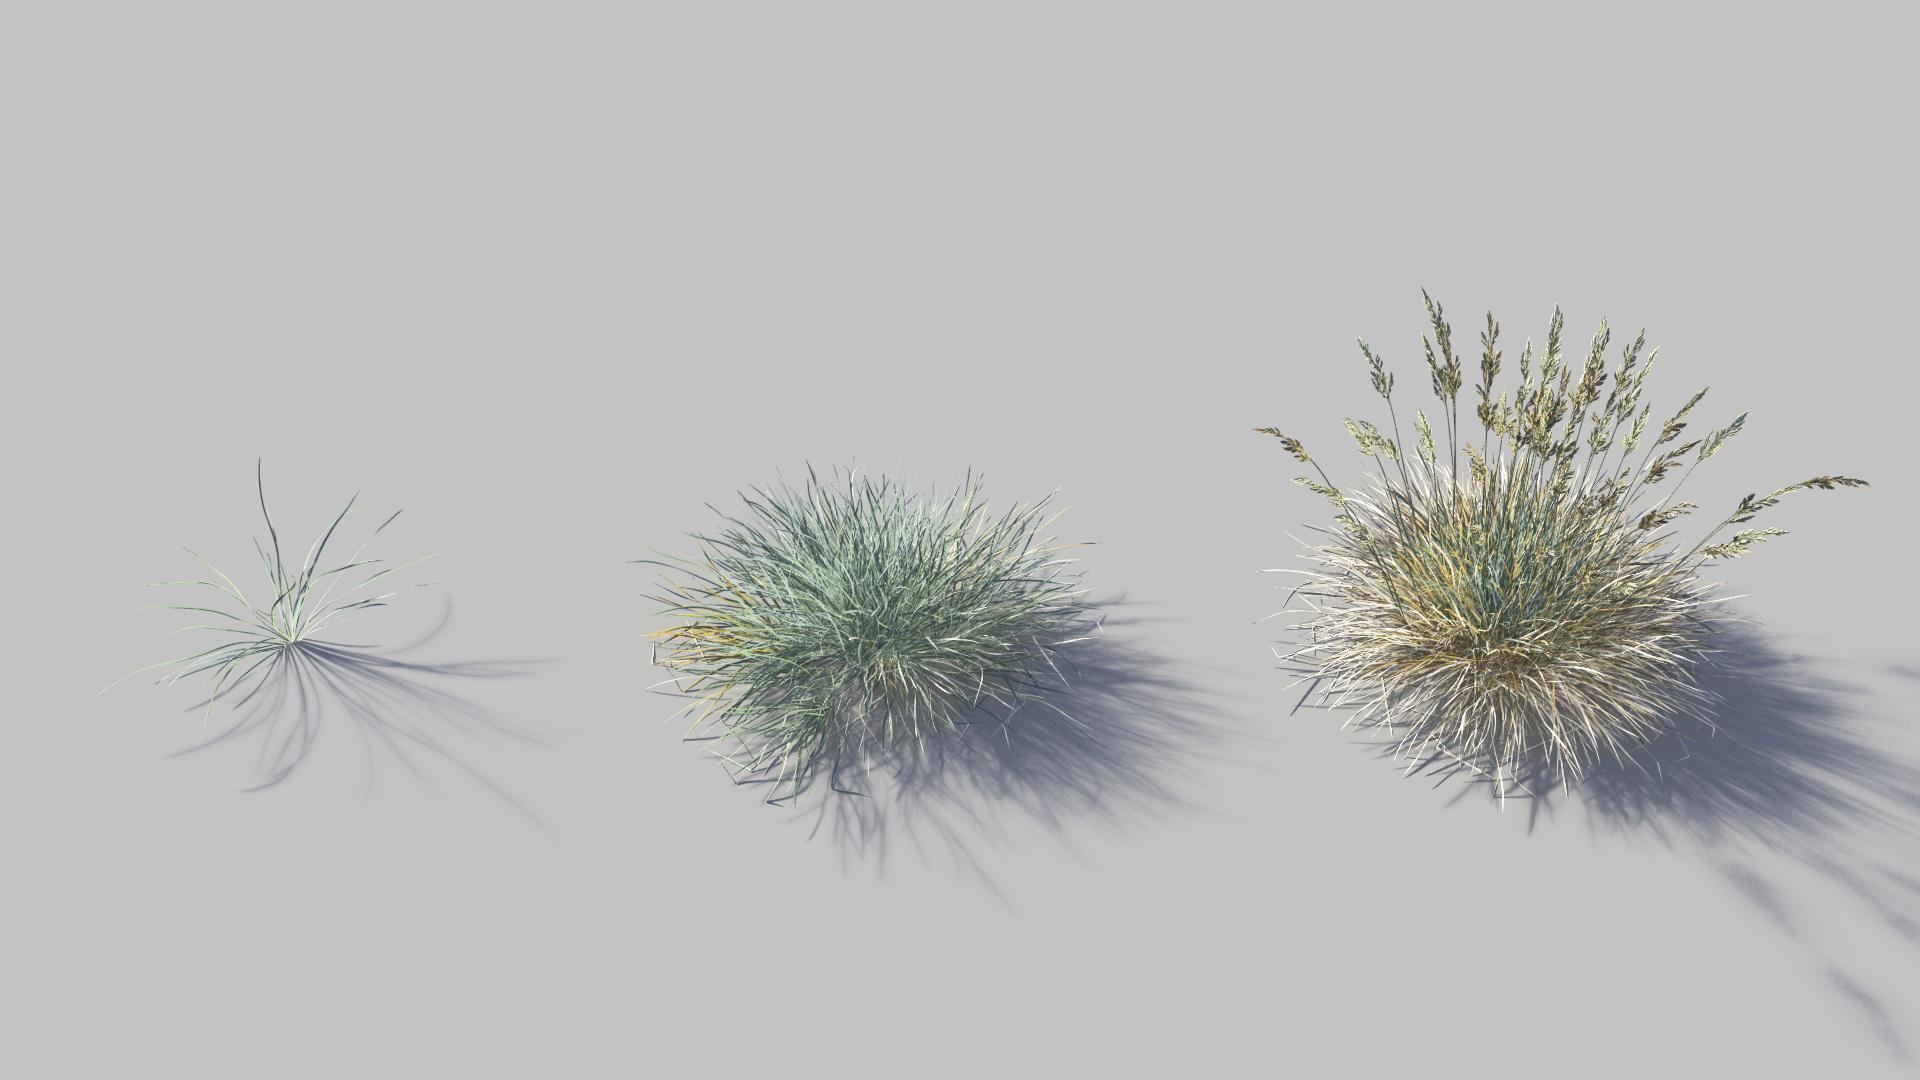 3D model of the Blue fescue Festuca glauca